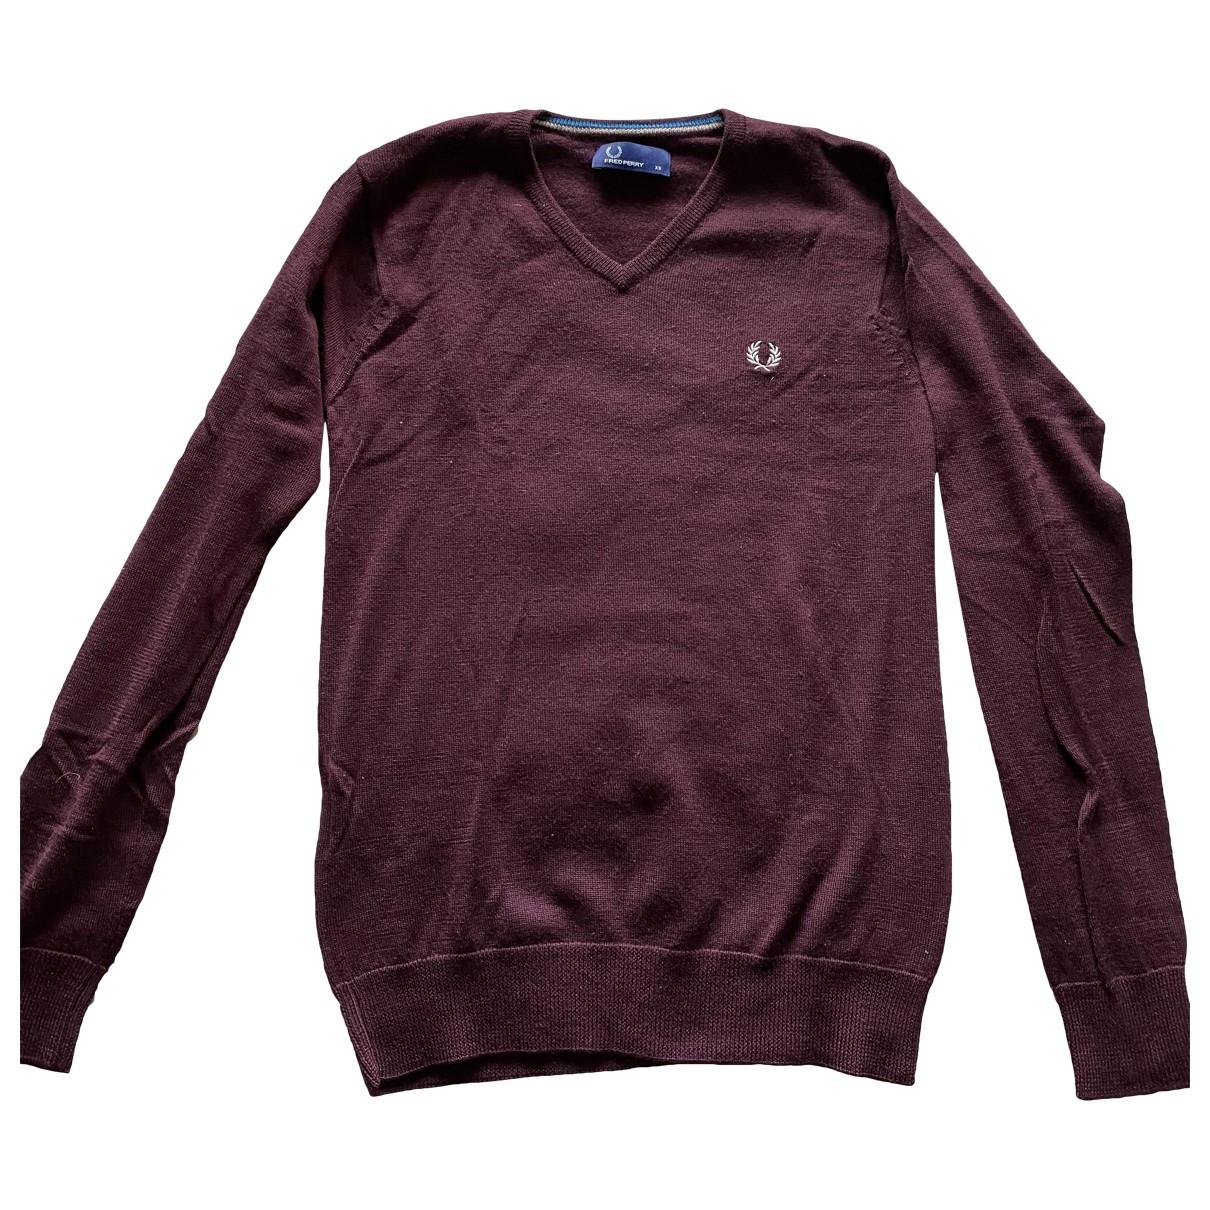 Fred Perry \N Burgundy Wool Knitwear & Sweatshirts for Men XS International